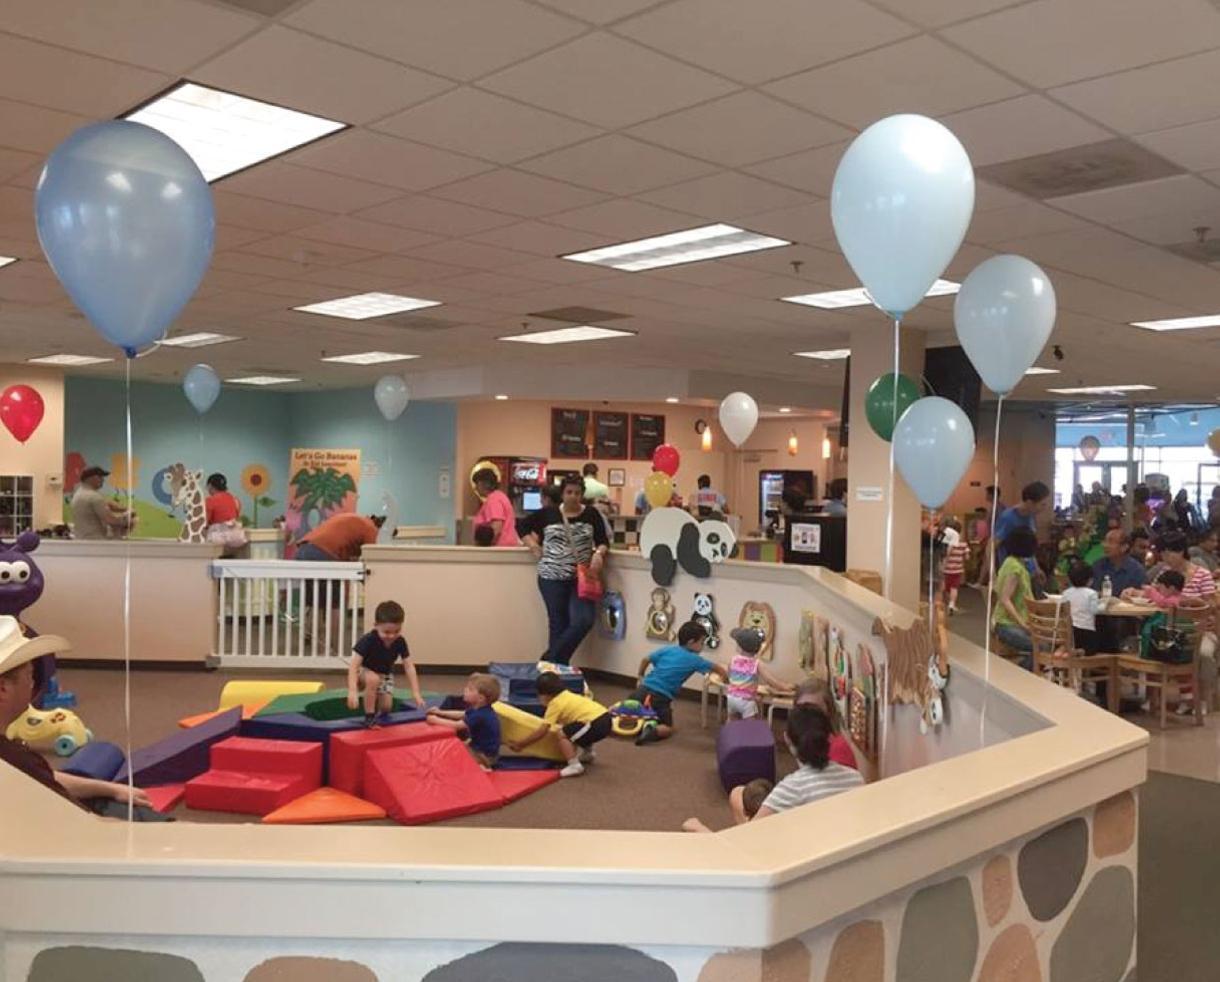 Deal Kid Junction Standard Birthday Party CertifiKID